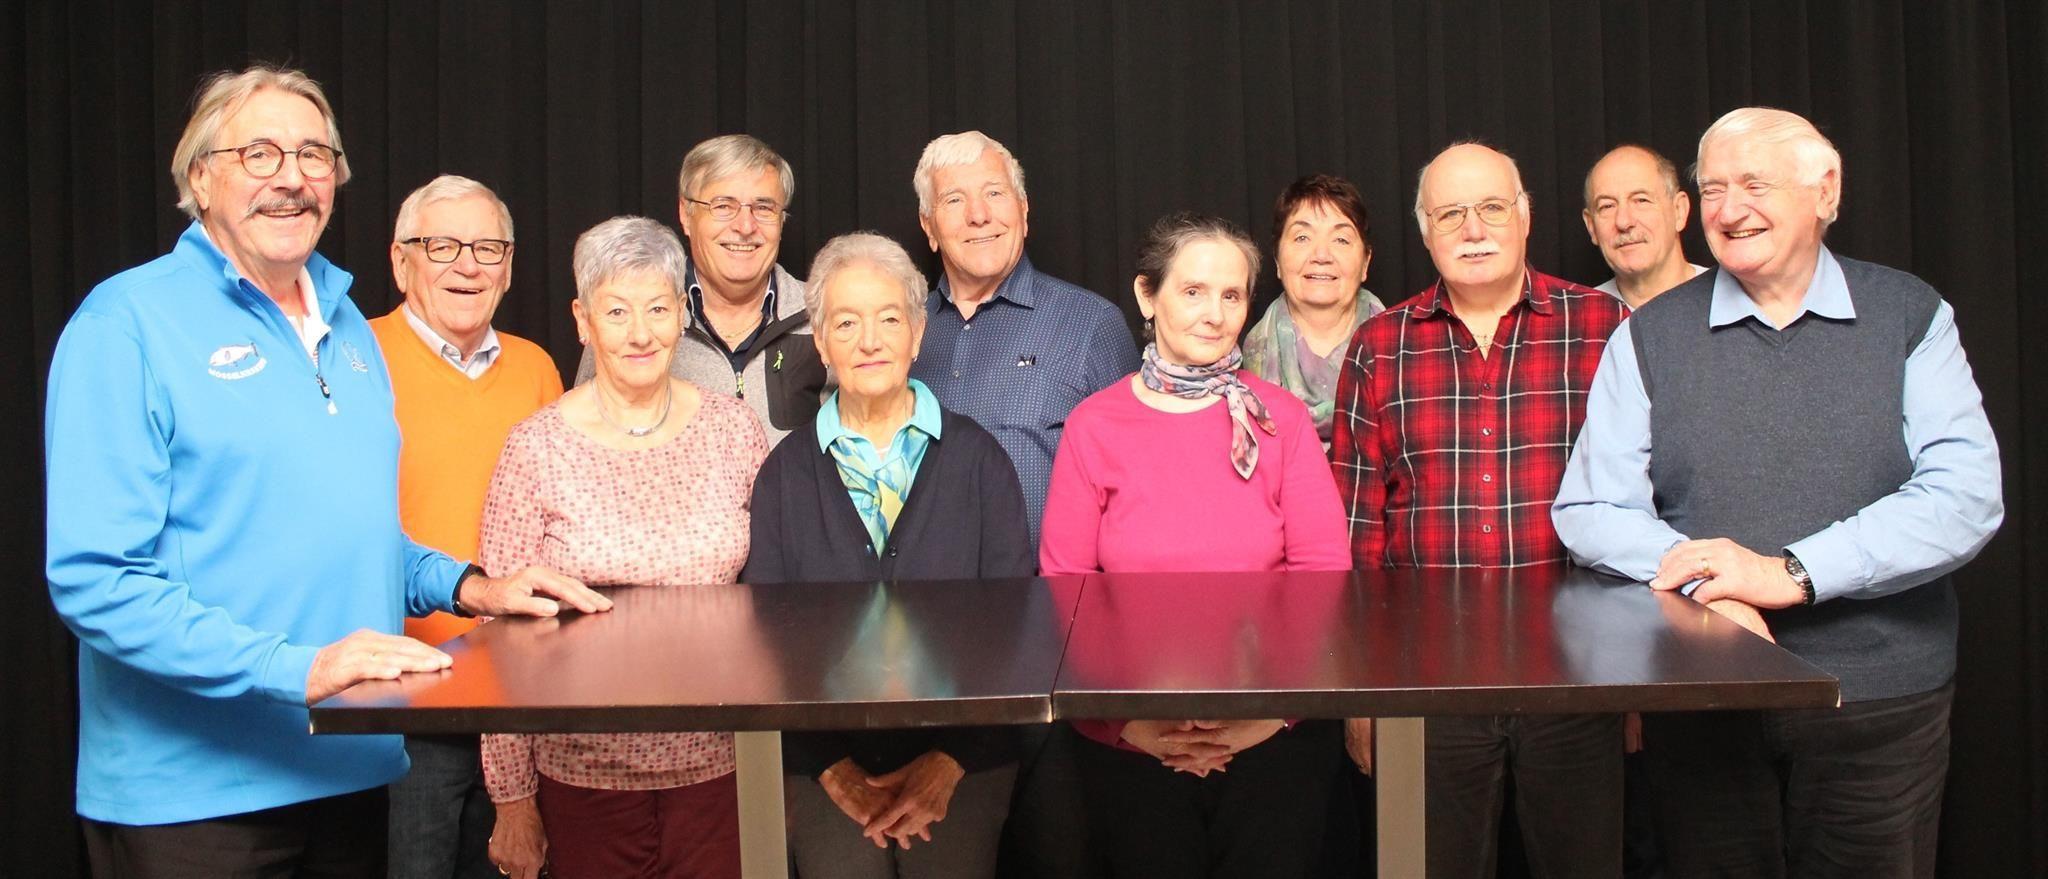 Seniorenbühne Brig-Glis